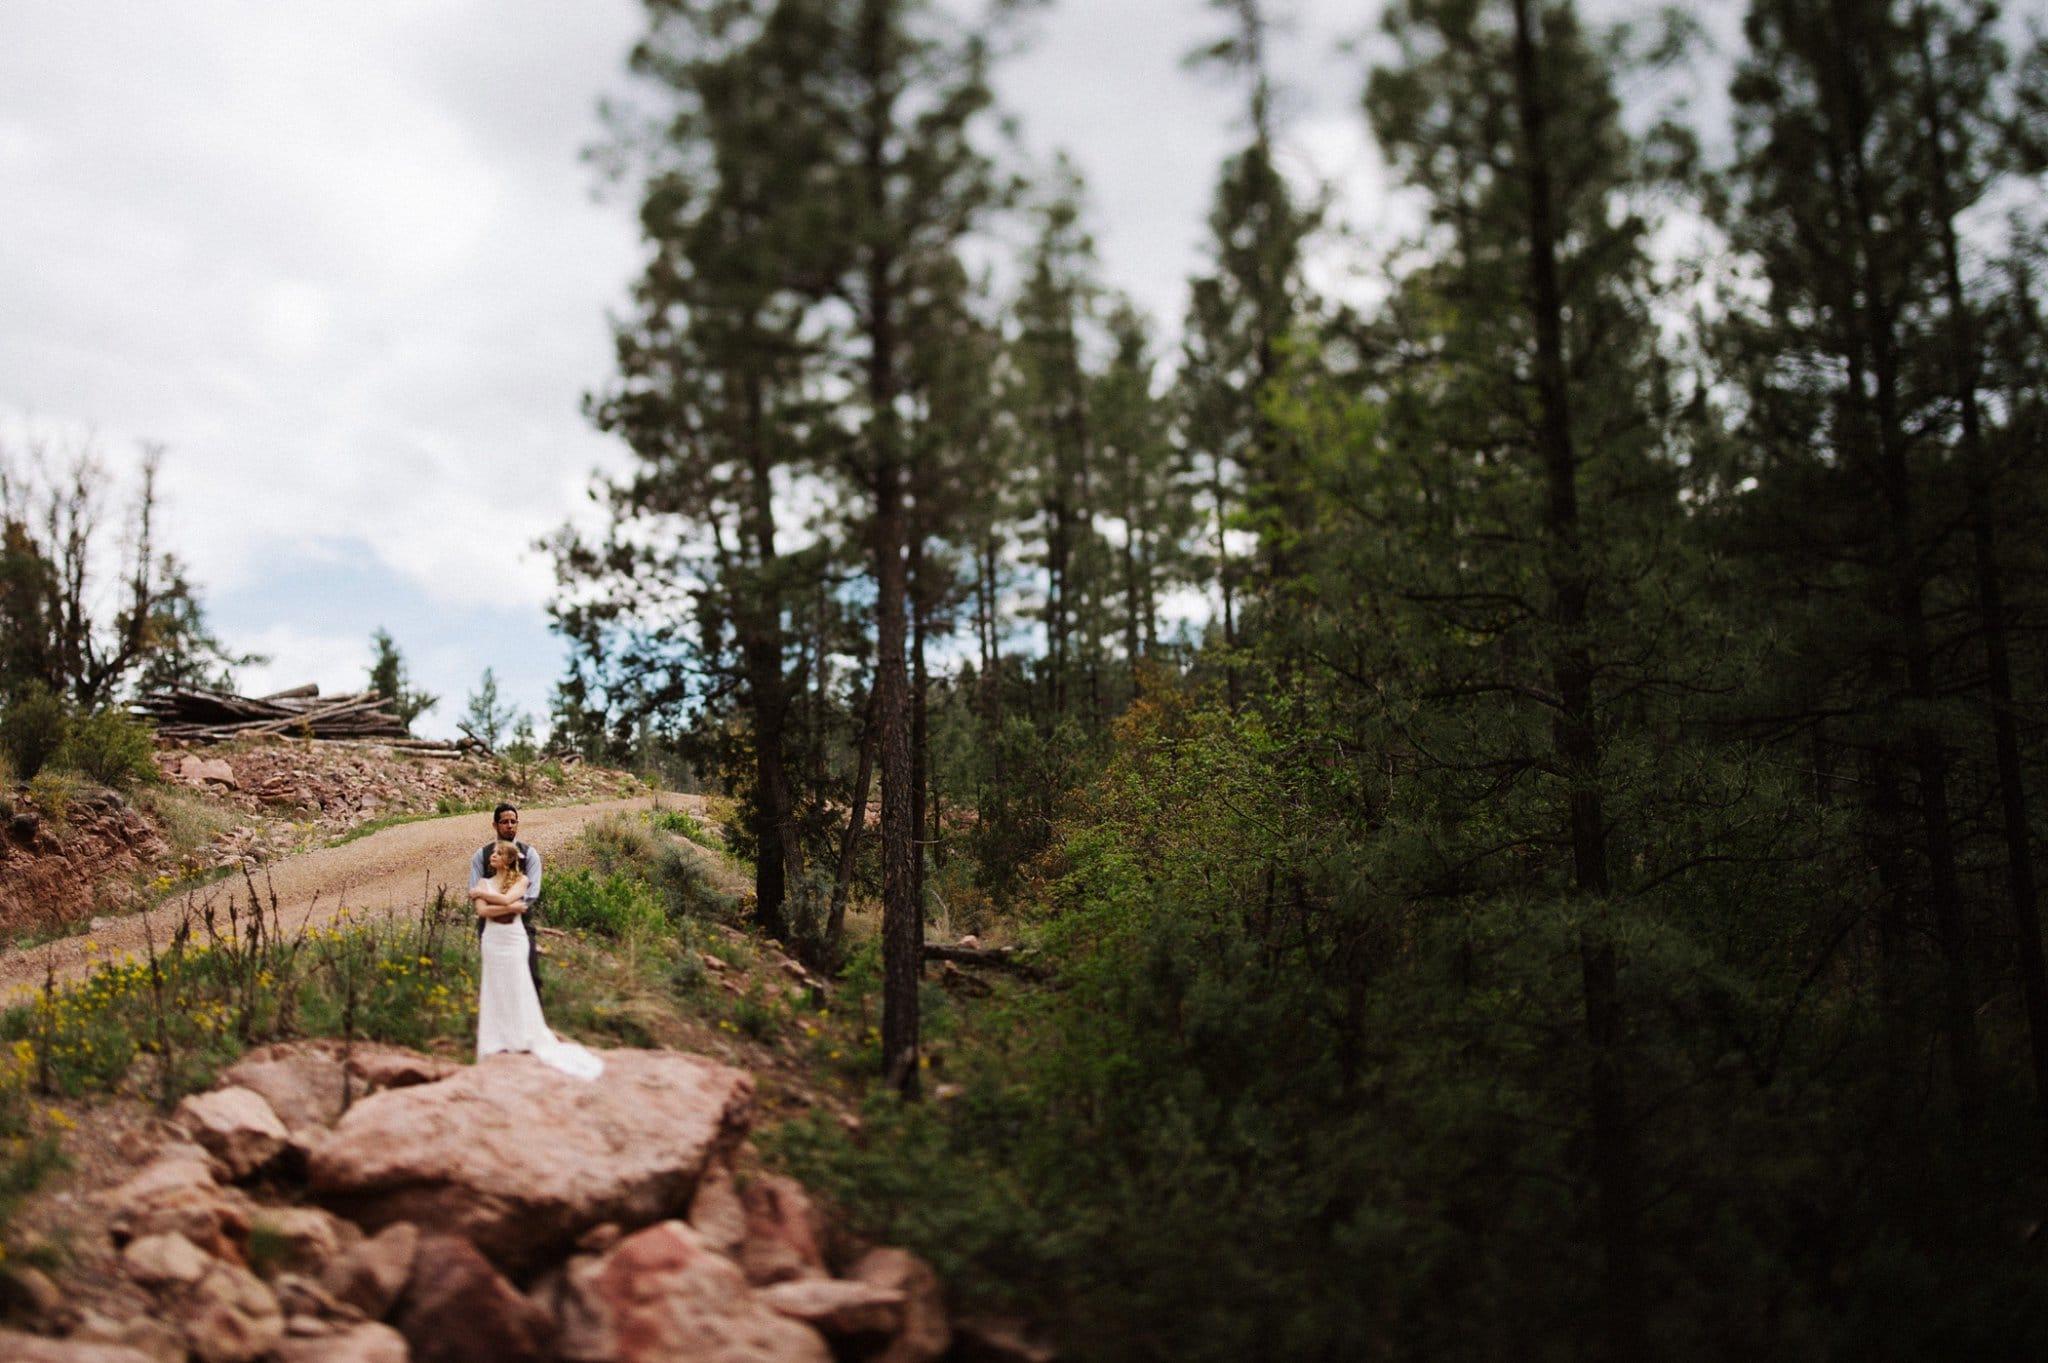 Tonto Creek Camp wedding by Michigan photographer Heather Jowett